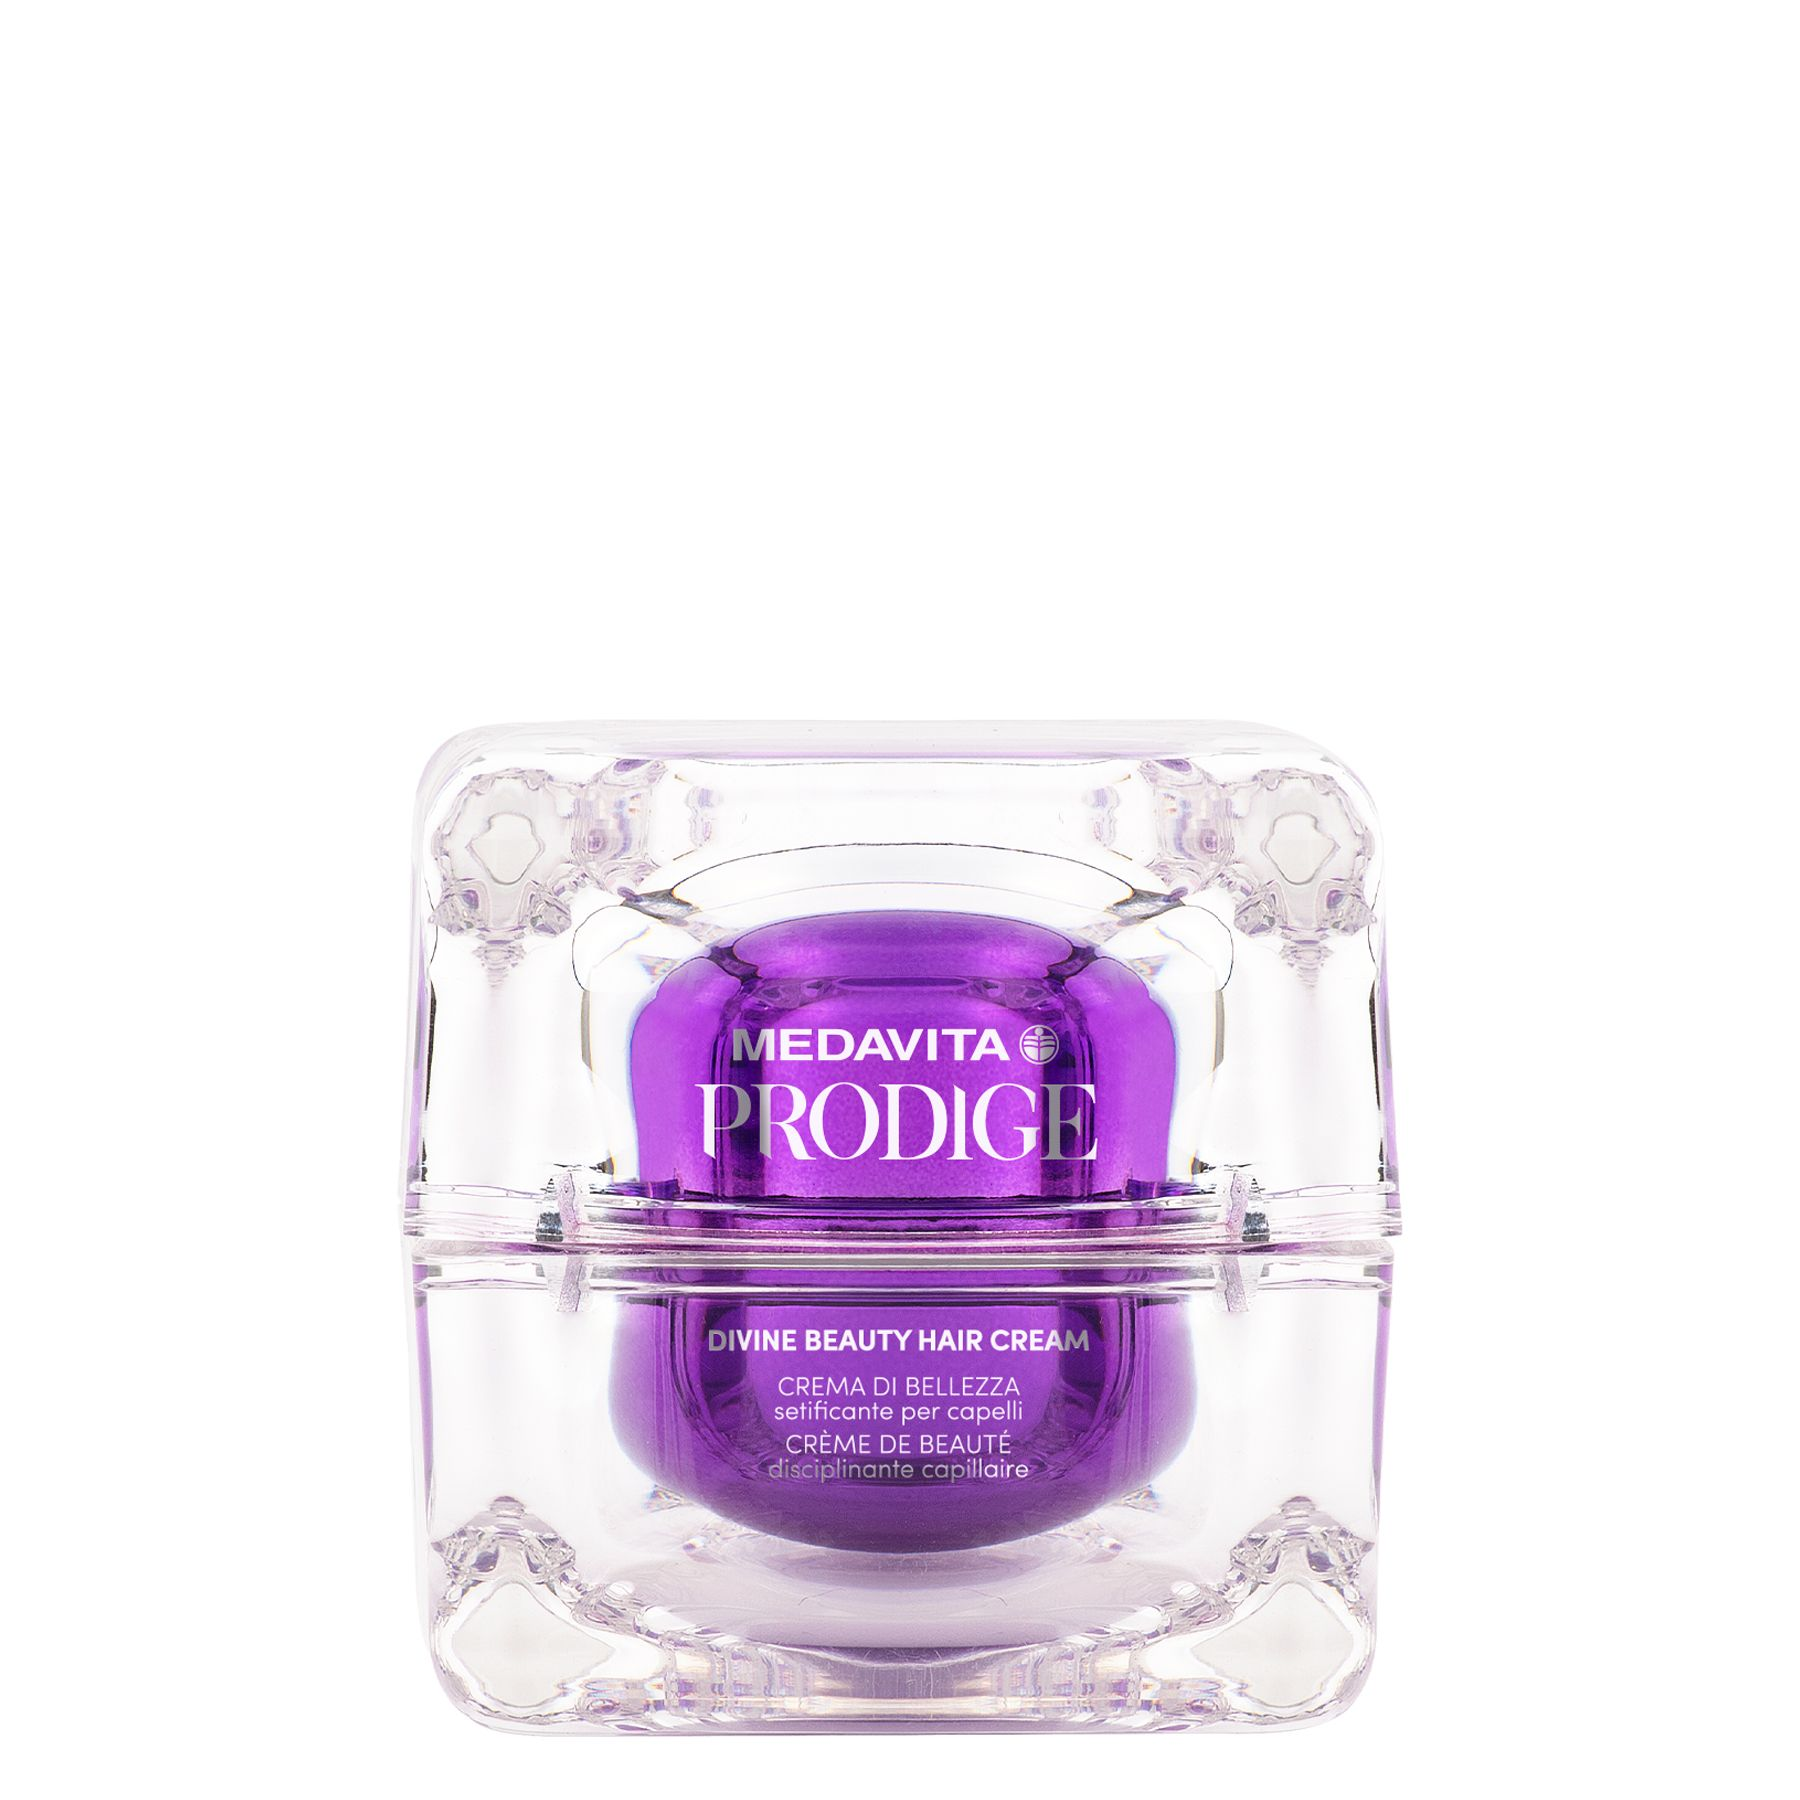 Prodige - Divine beauty hair cream 50ml